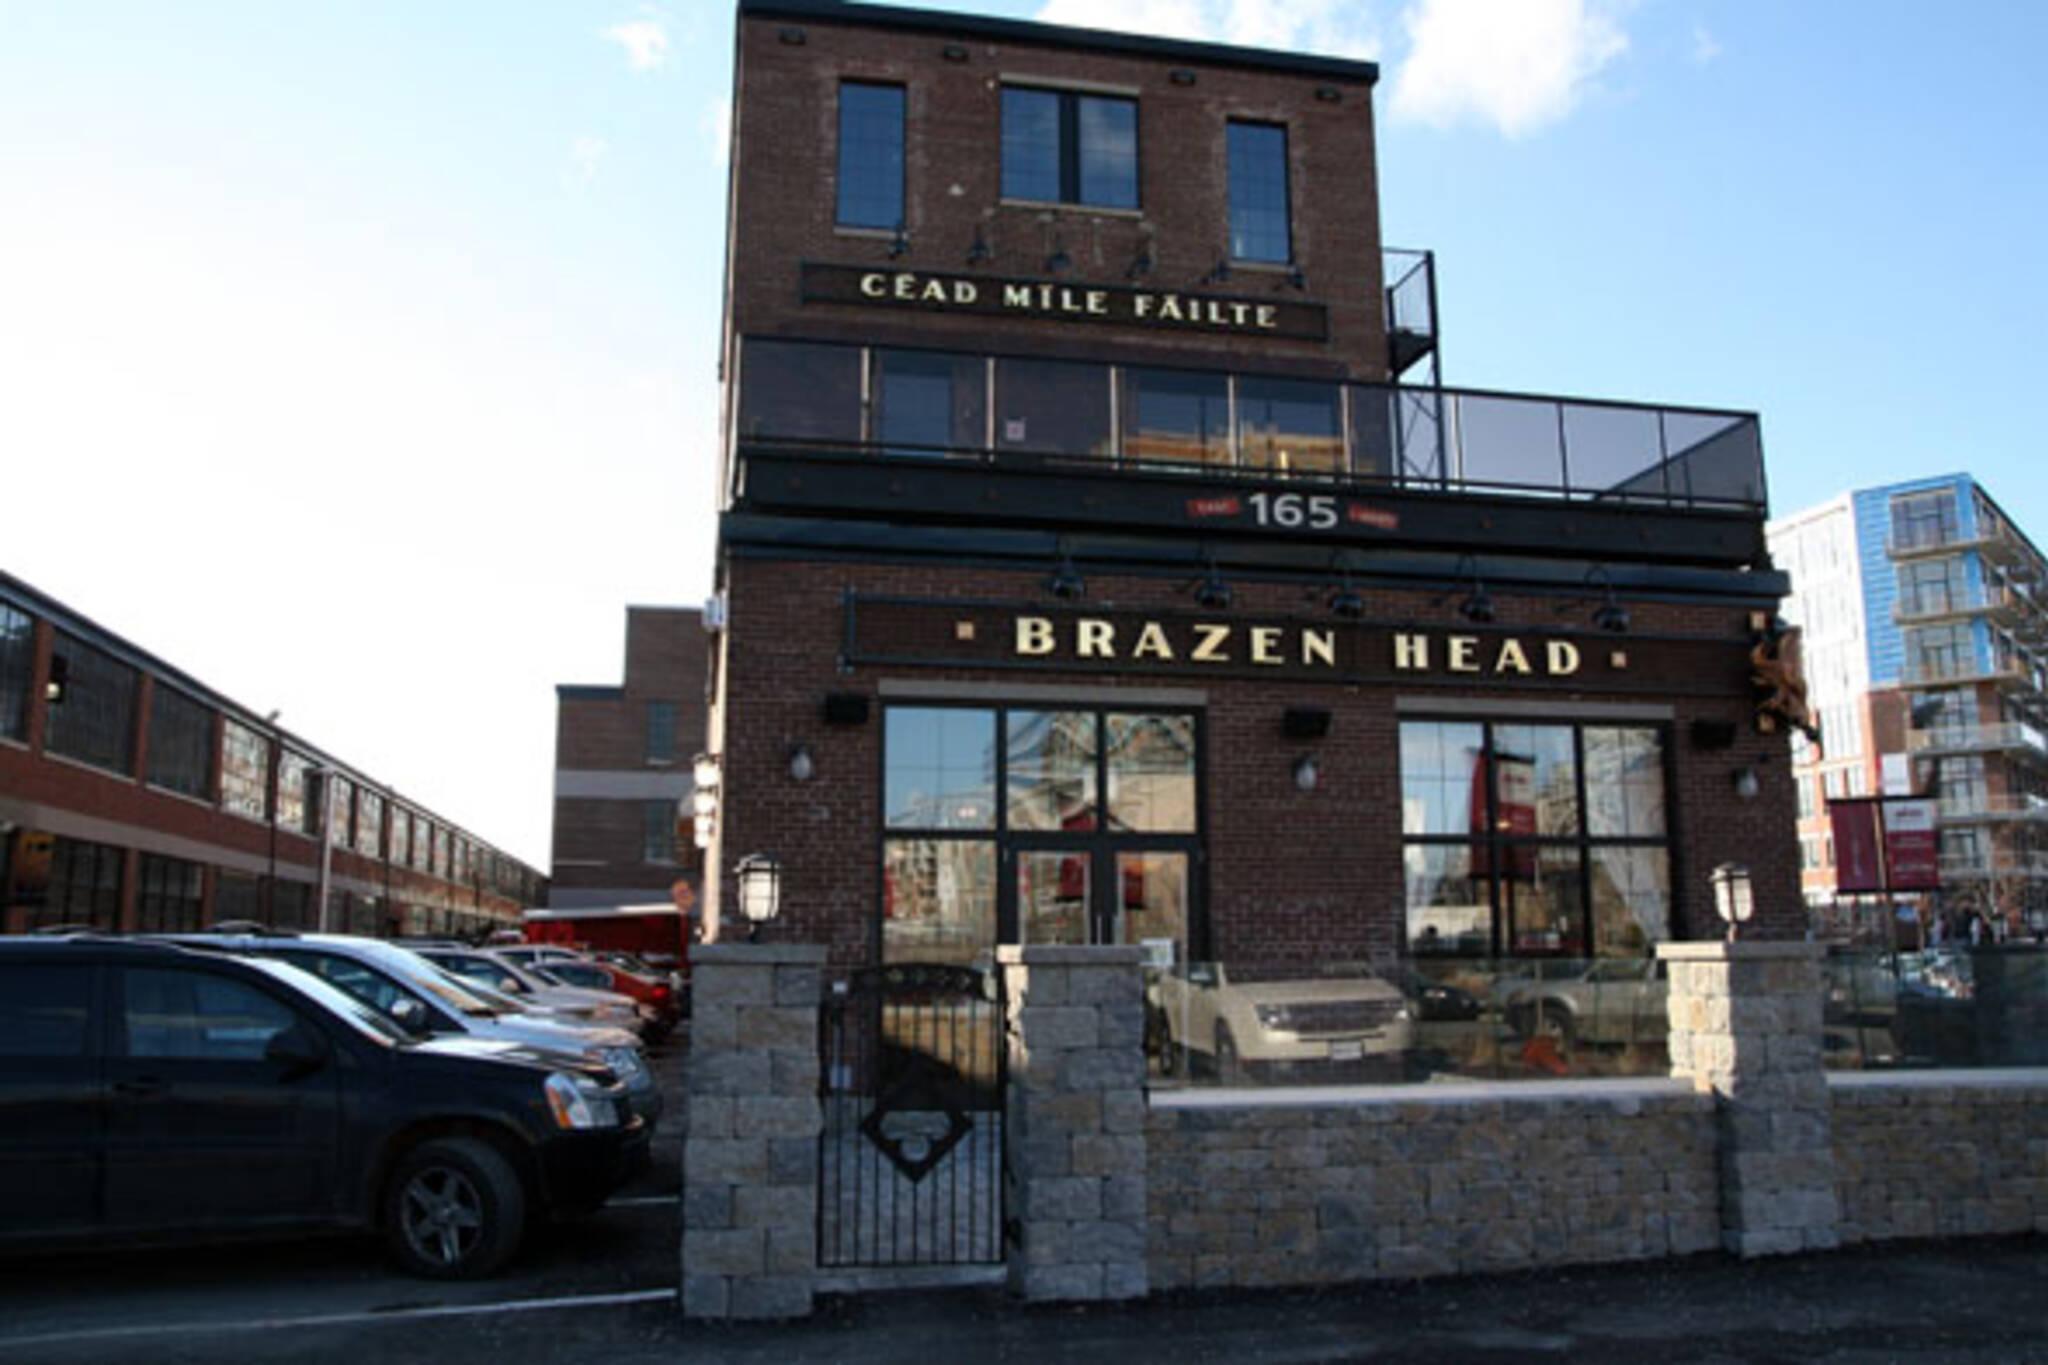 Brazen Head